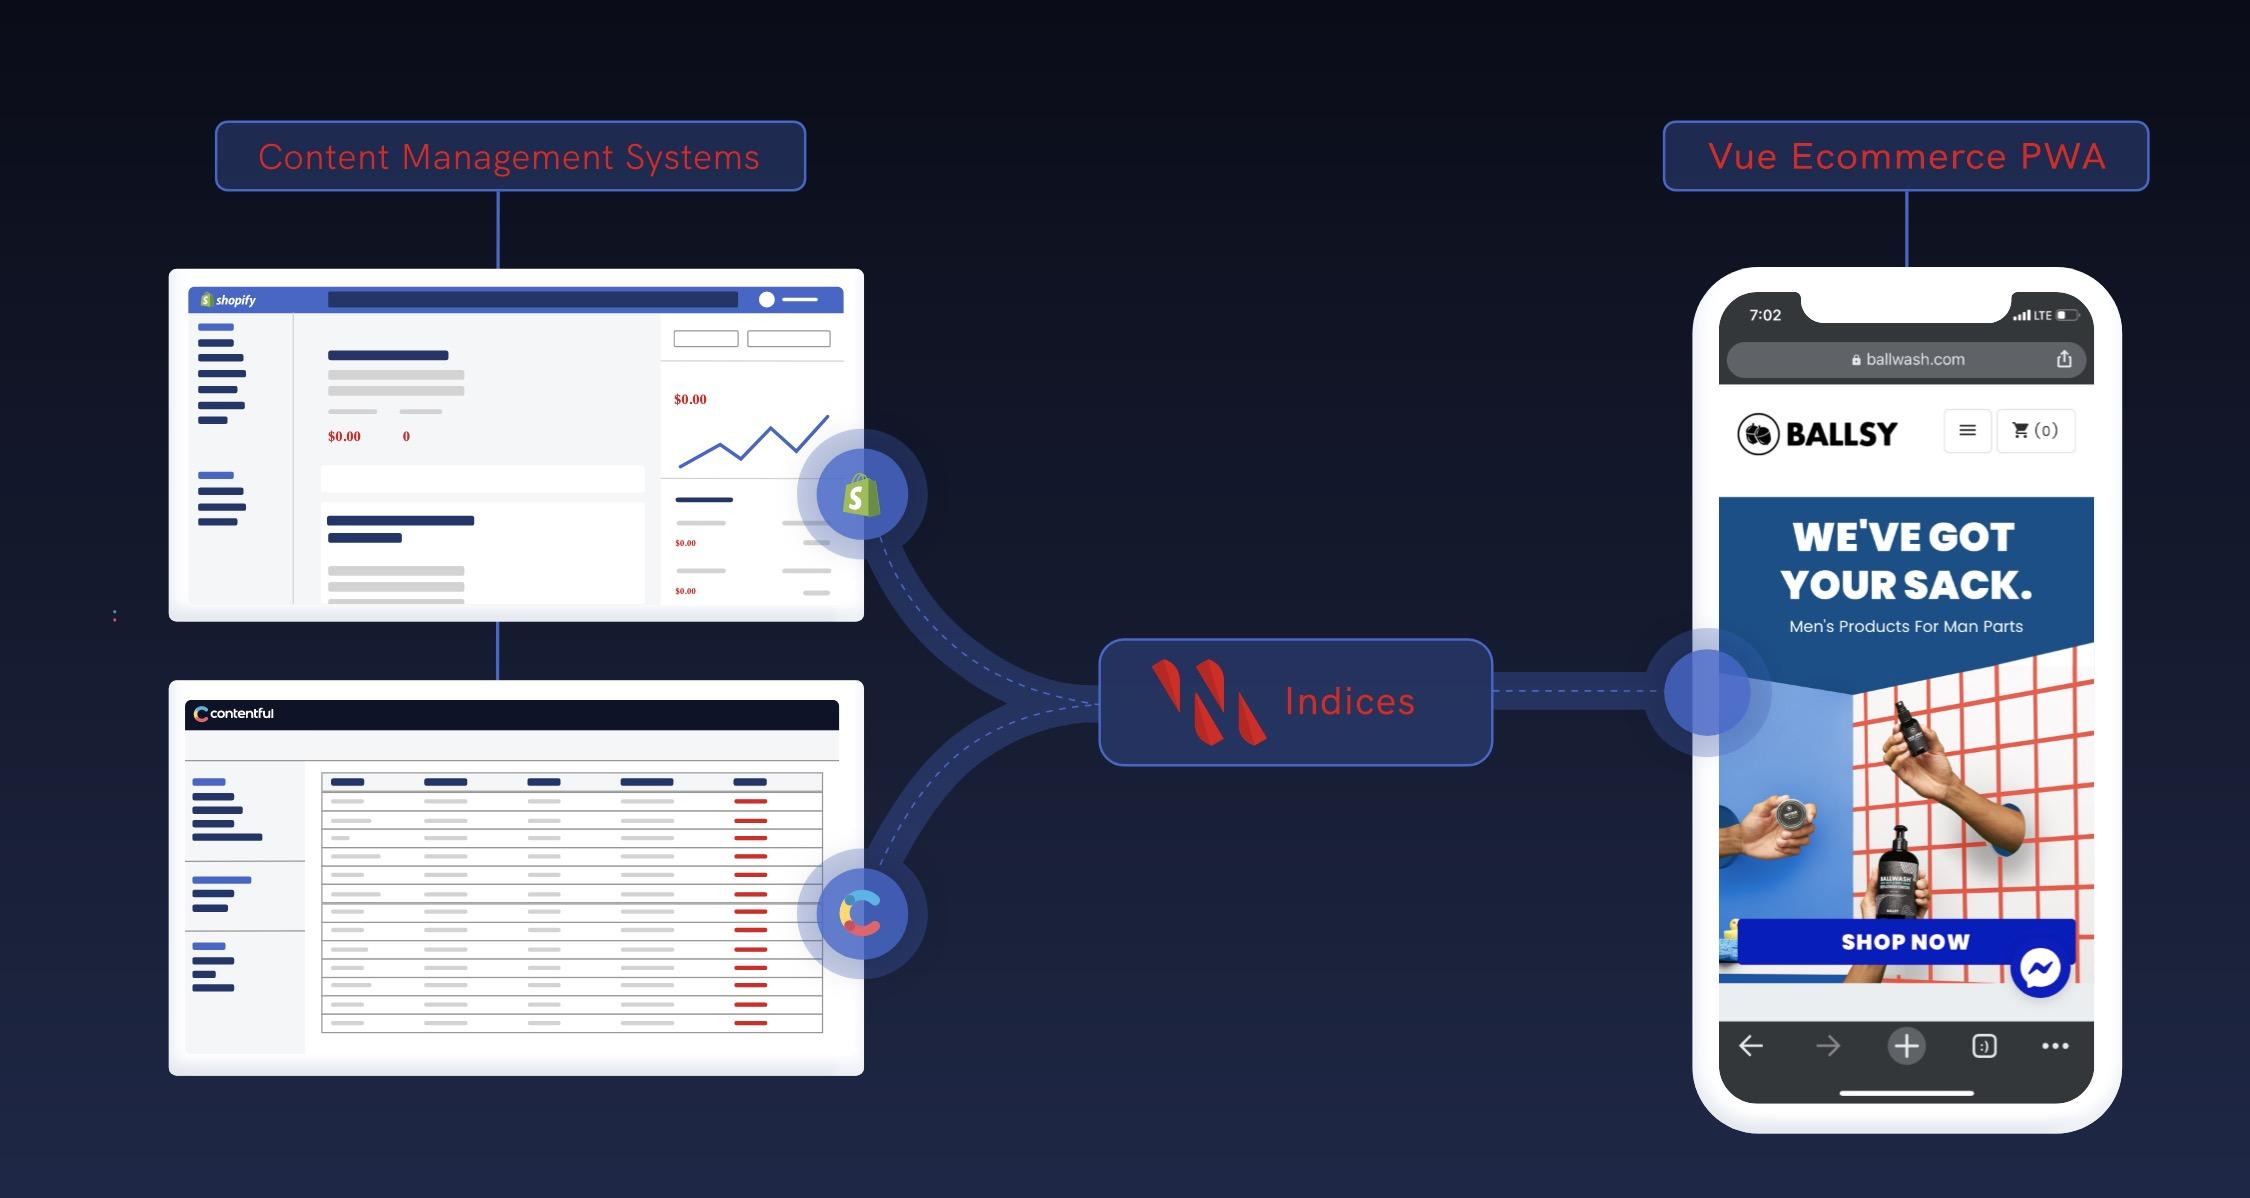 Nacelle raises $4.8M for its headless e-commerce platform 2